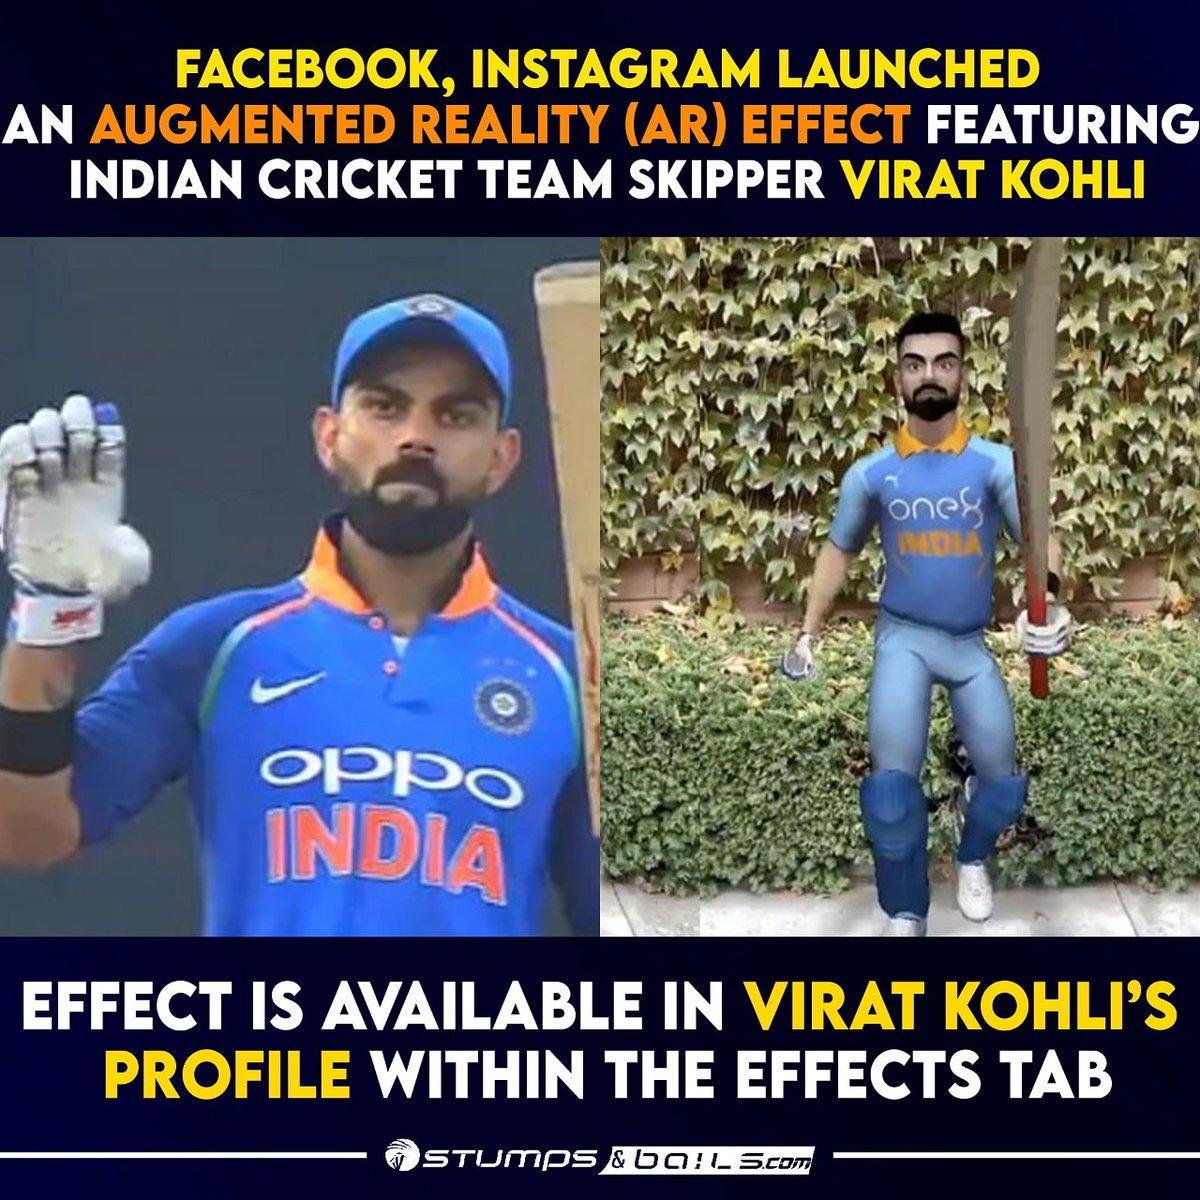 Try now @imVkohli #Instagram  Follow us @stumpnbails #IndianCricketTeam #Indiancricketer #ViratKohli #AR #Augumentedreality #ARfeatures #Instagrameffect #Viratkholi18 #Teamindia #INDvsAUS